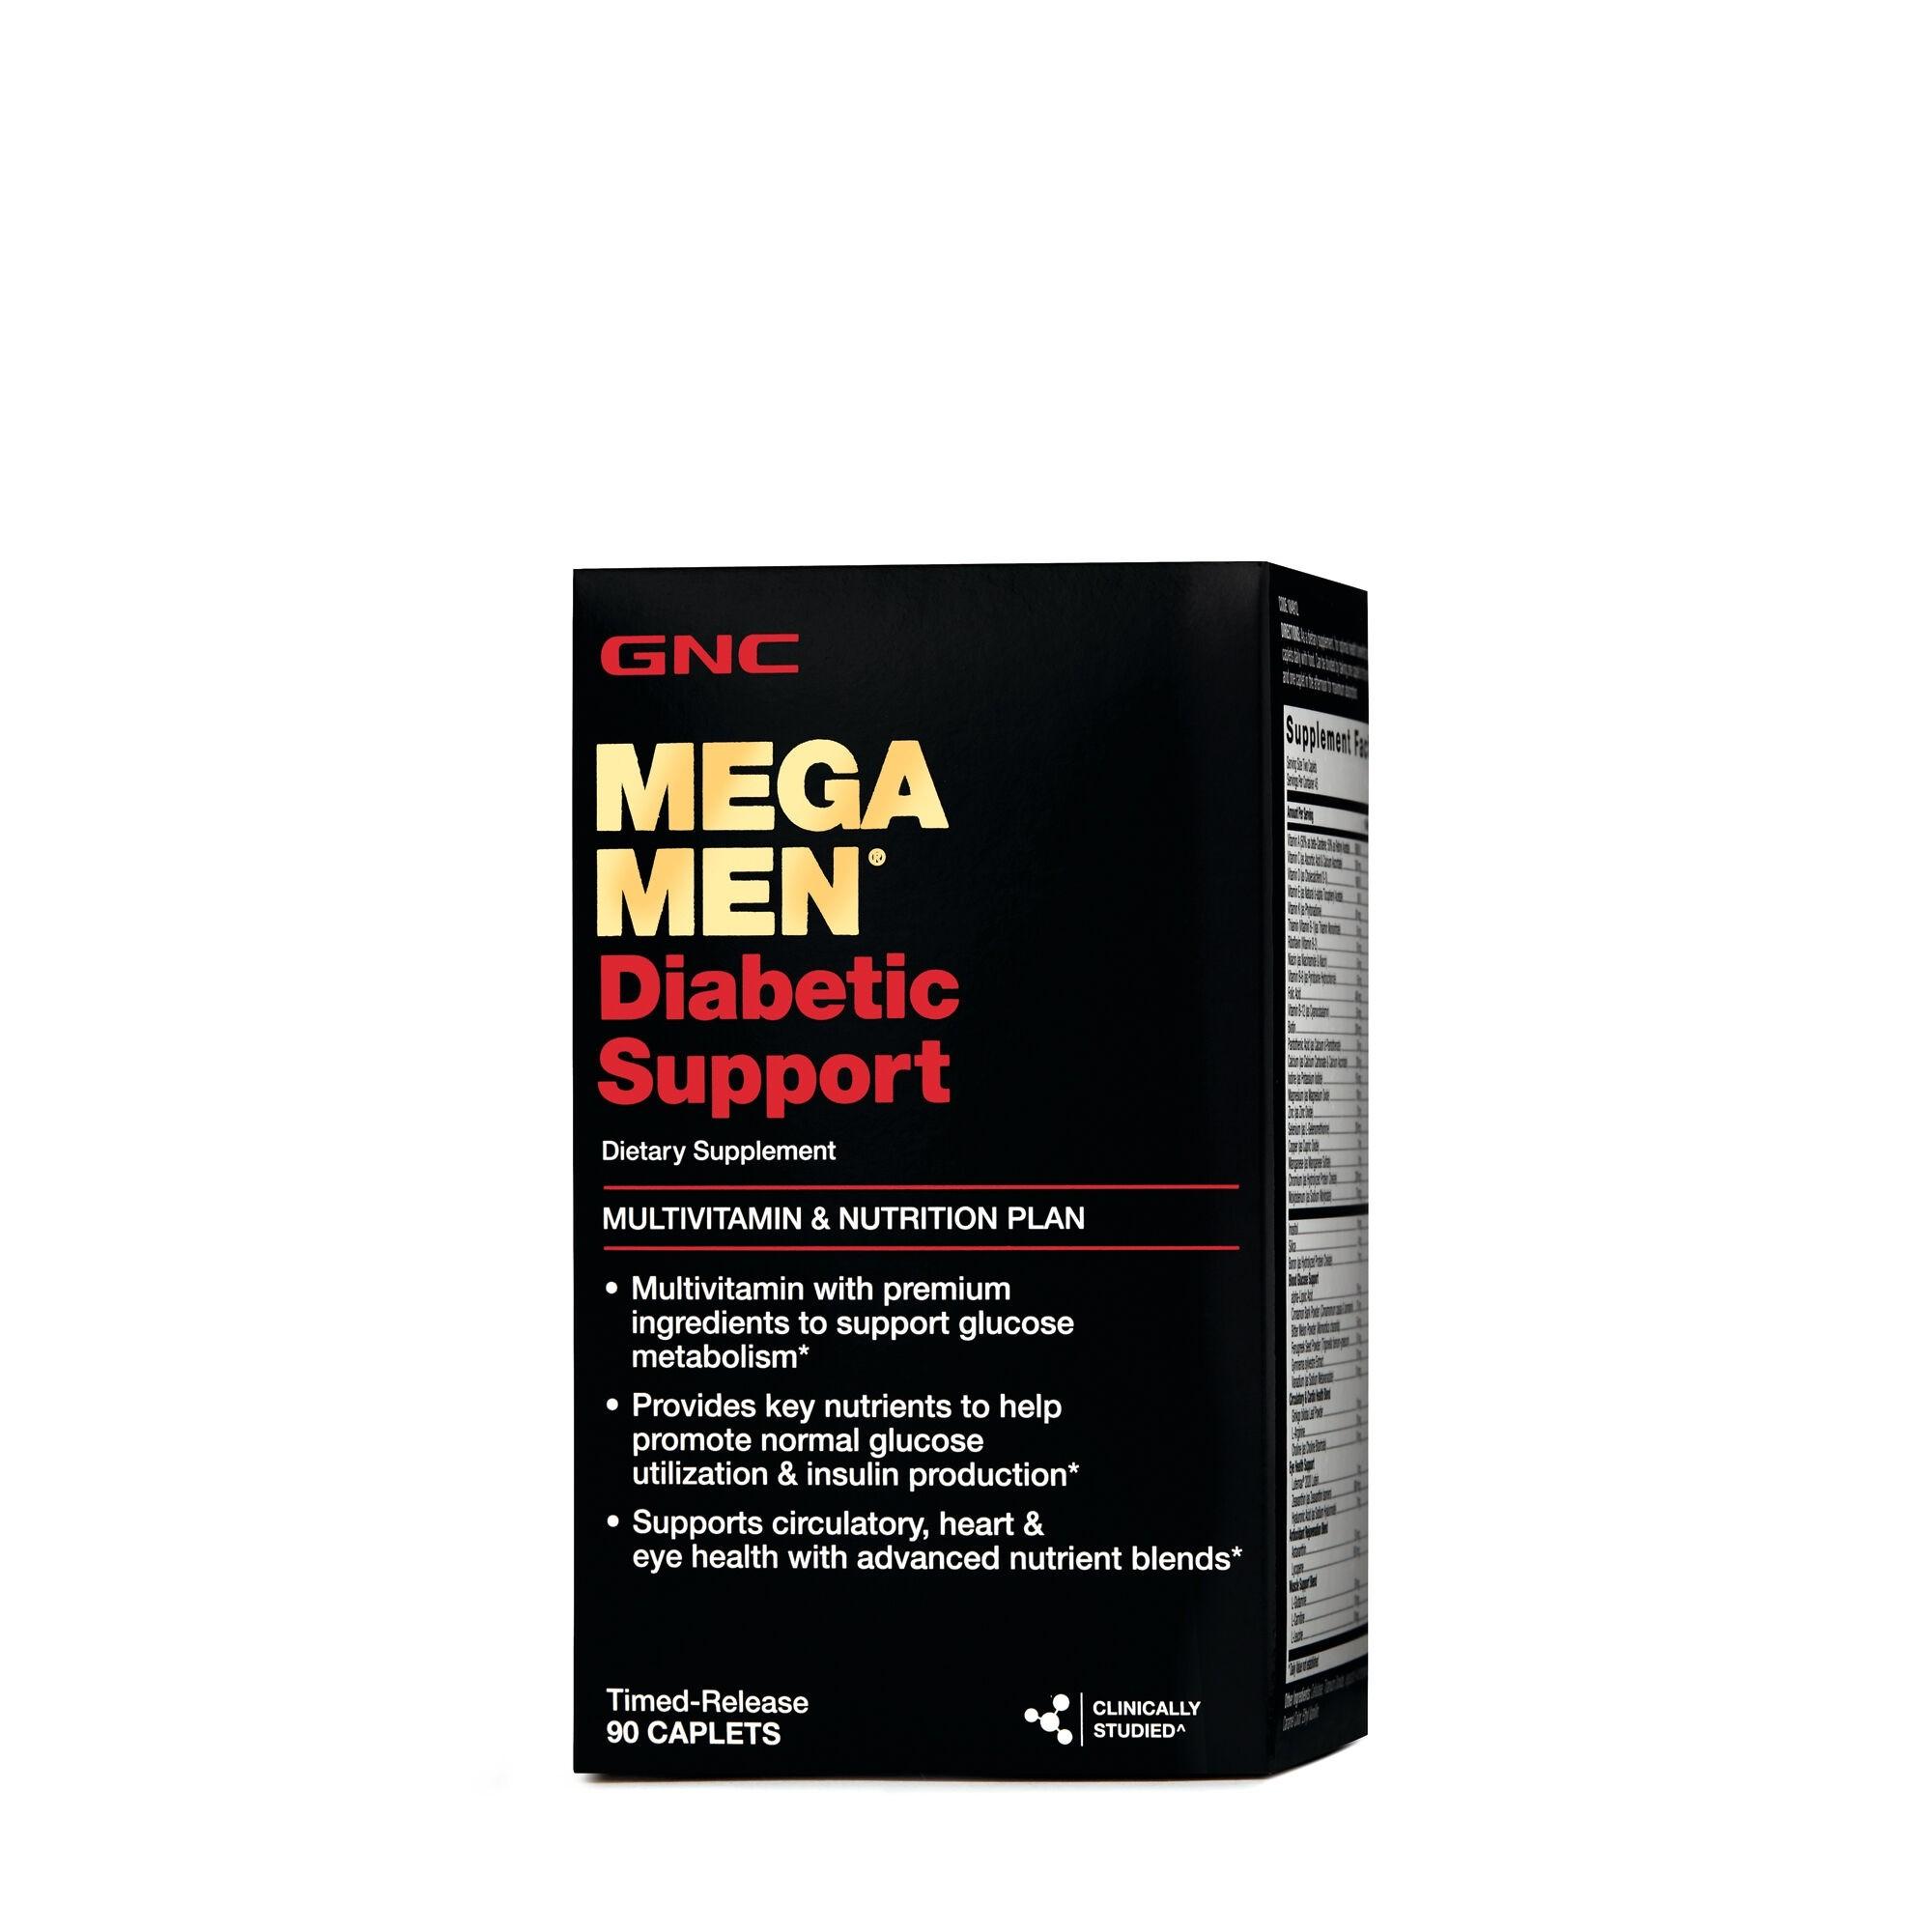 GNC Mega Men® Diabetic Support, Multivitamine Pentru Barbati Pentru Suport Diabetic, 90 tb